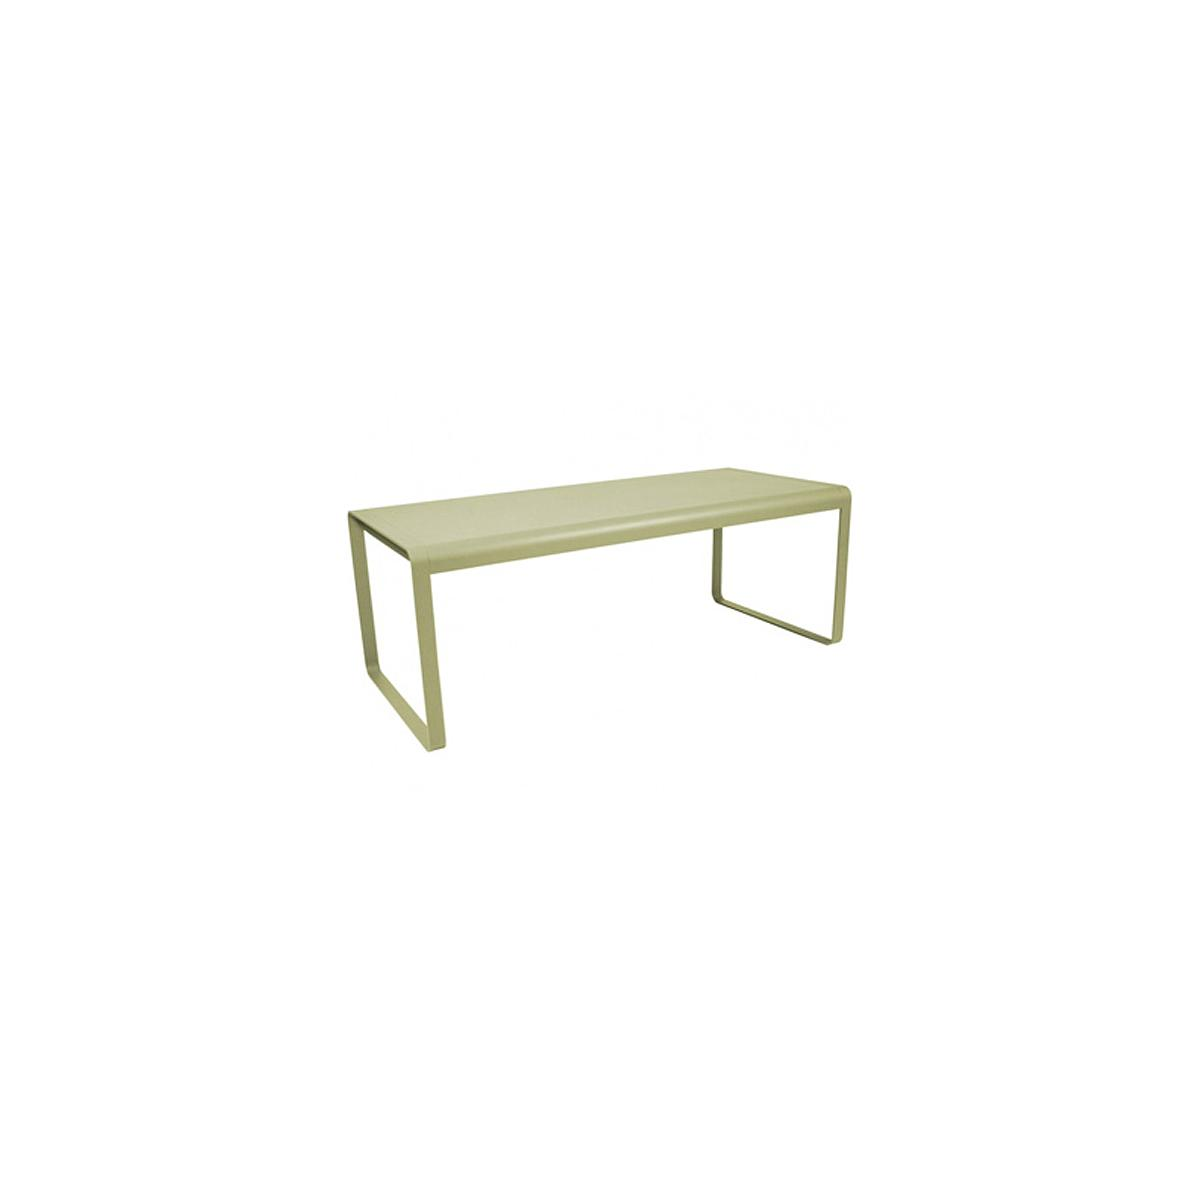 Table de jardin BELLEVIE Fermob tilleul